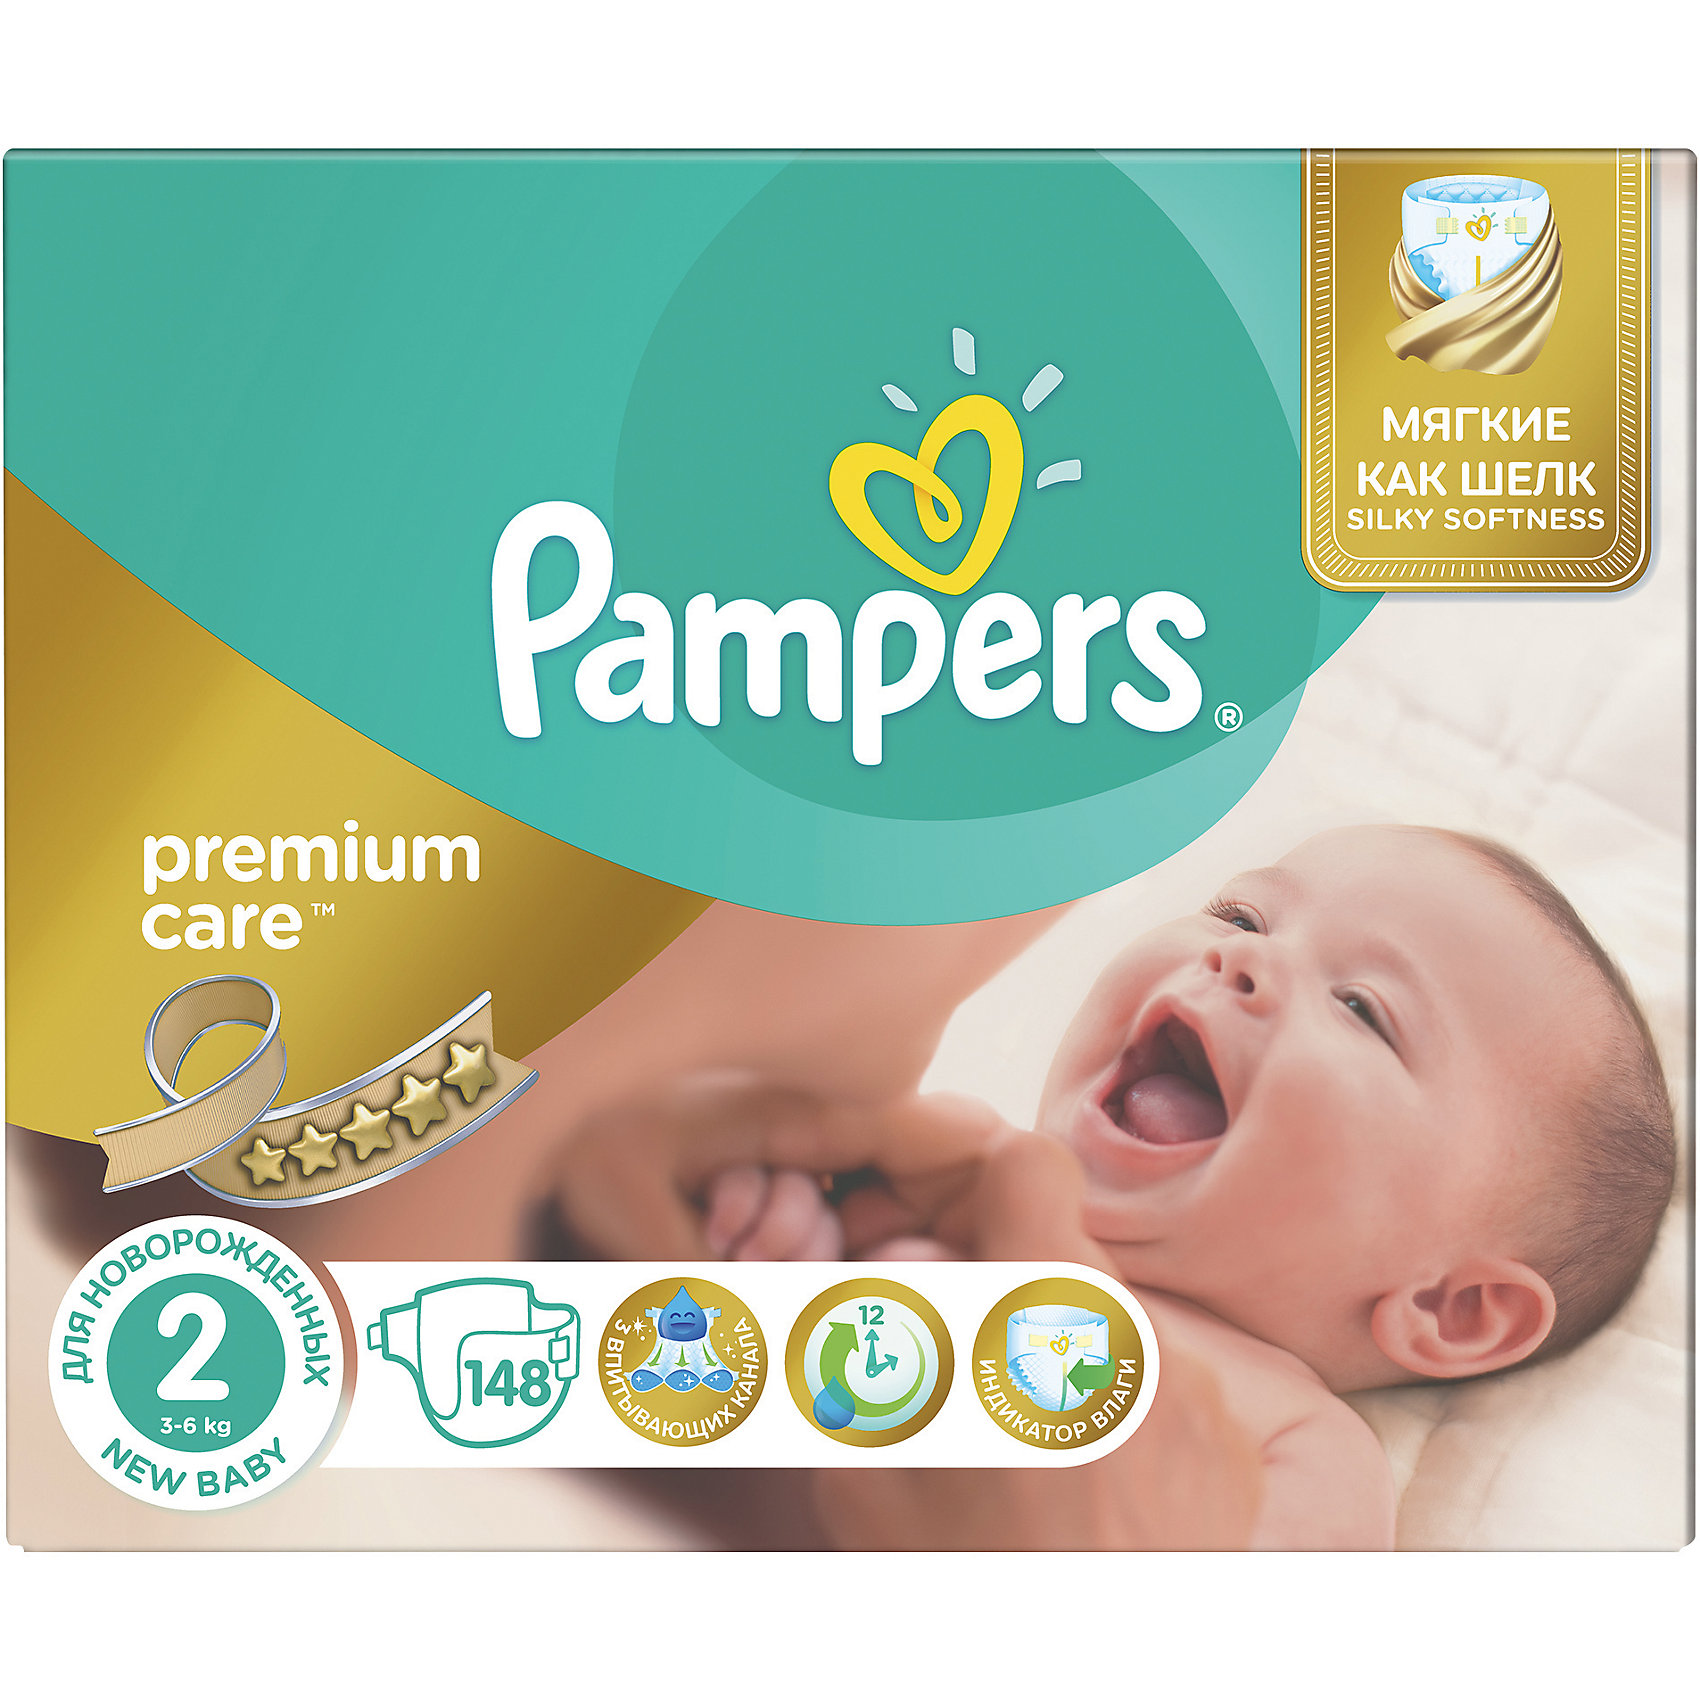 Подгузники Pampers Premium Care, New baby,3-6 кг, 2 размер, Mega pack, 148 шт., PampersПодгузники 5-12 кг.<br><br><br>Ширина мм: 372<br>Глубина мм: 231<br>Высота мм: 311<br>Вес г: 357<br>Возраст от месяцев: 0<br>Возраст до месяцев: 3<br>Пол: Унисекс<br>Возраст: Детский<br>SKU: 5516310